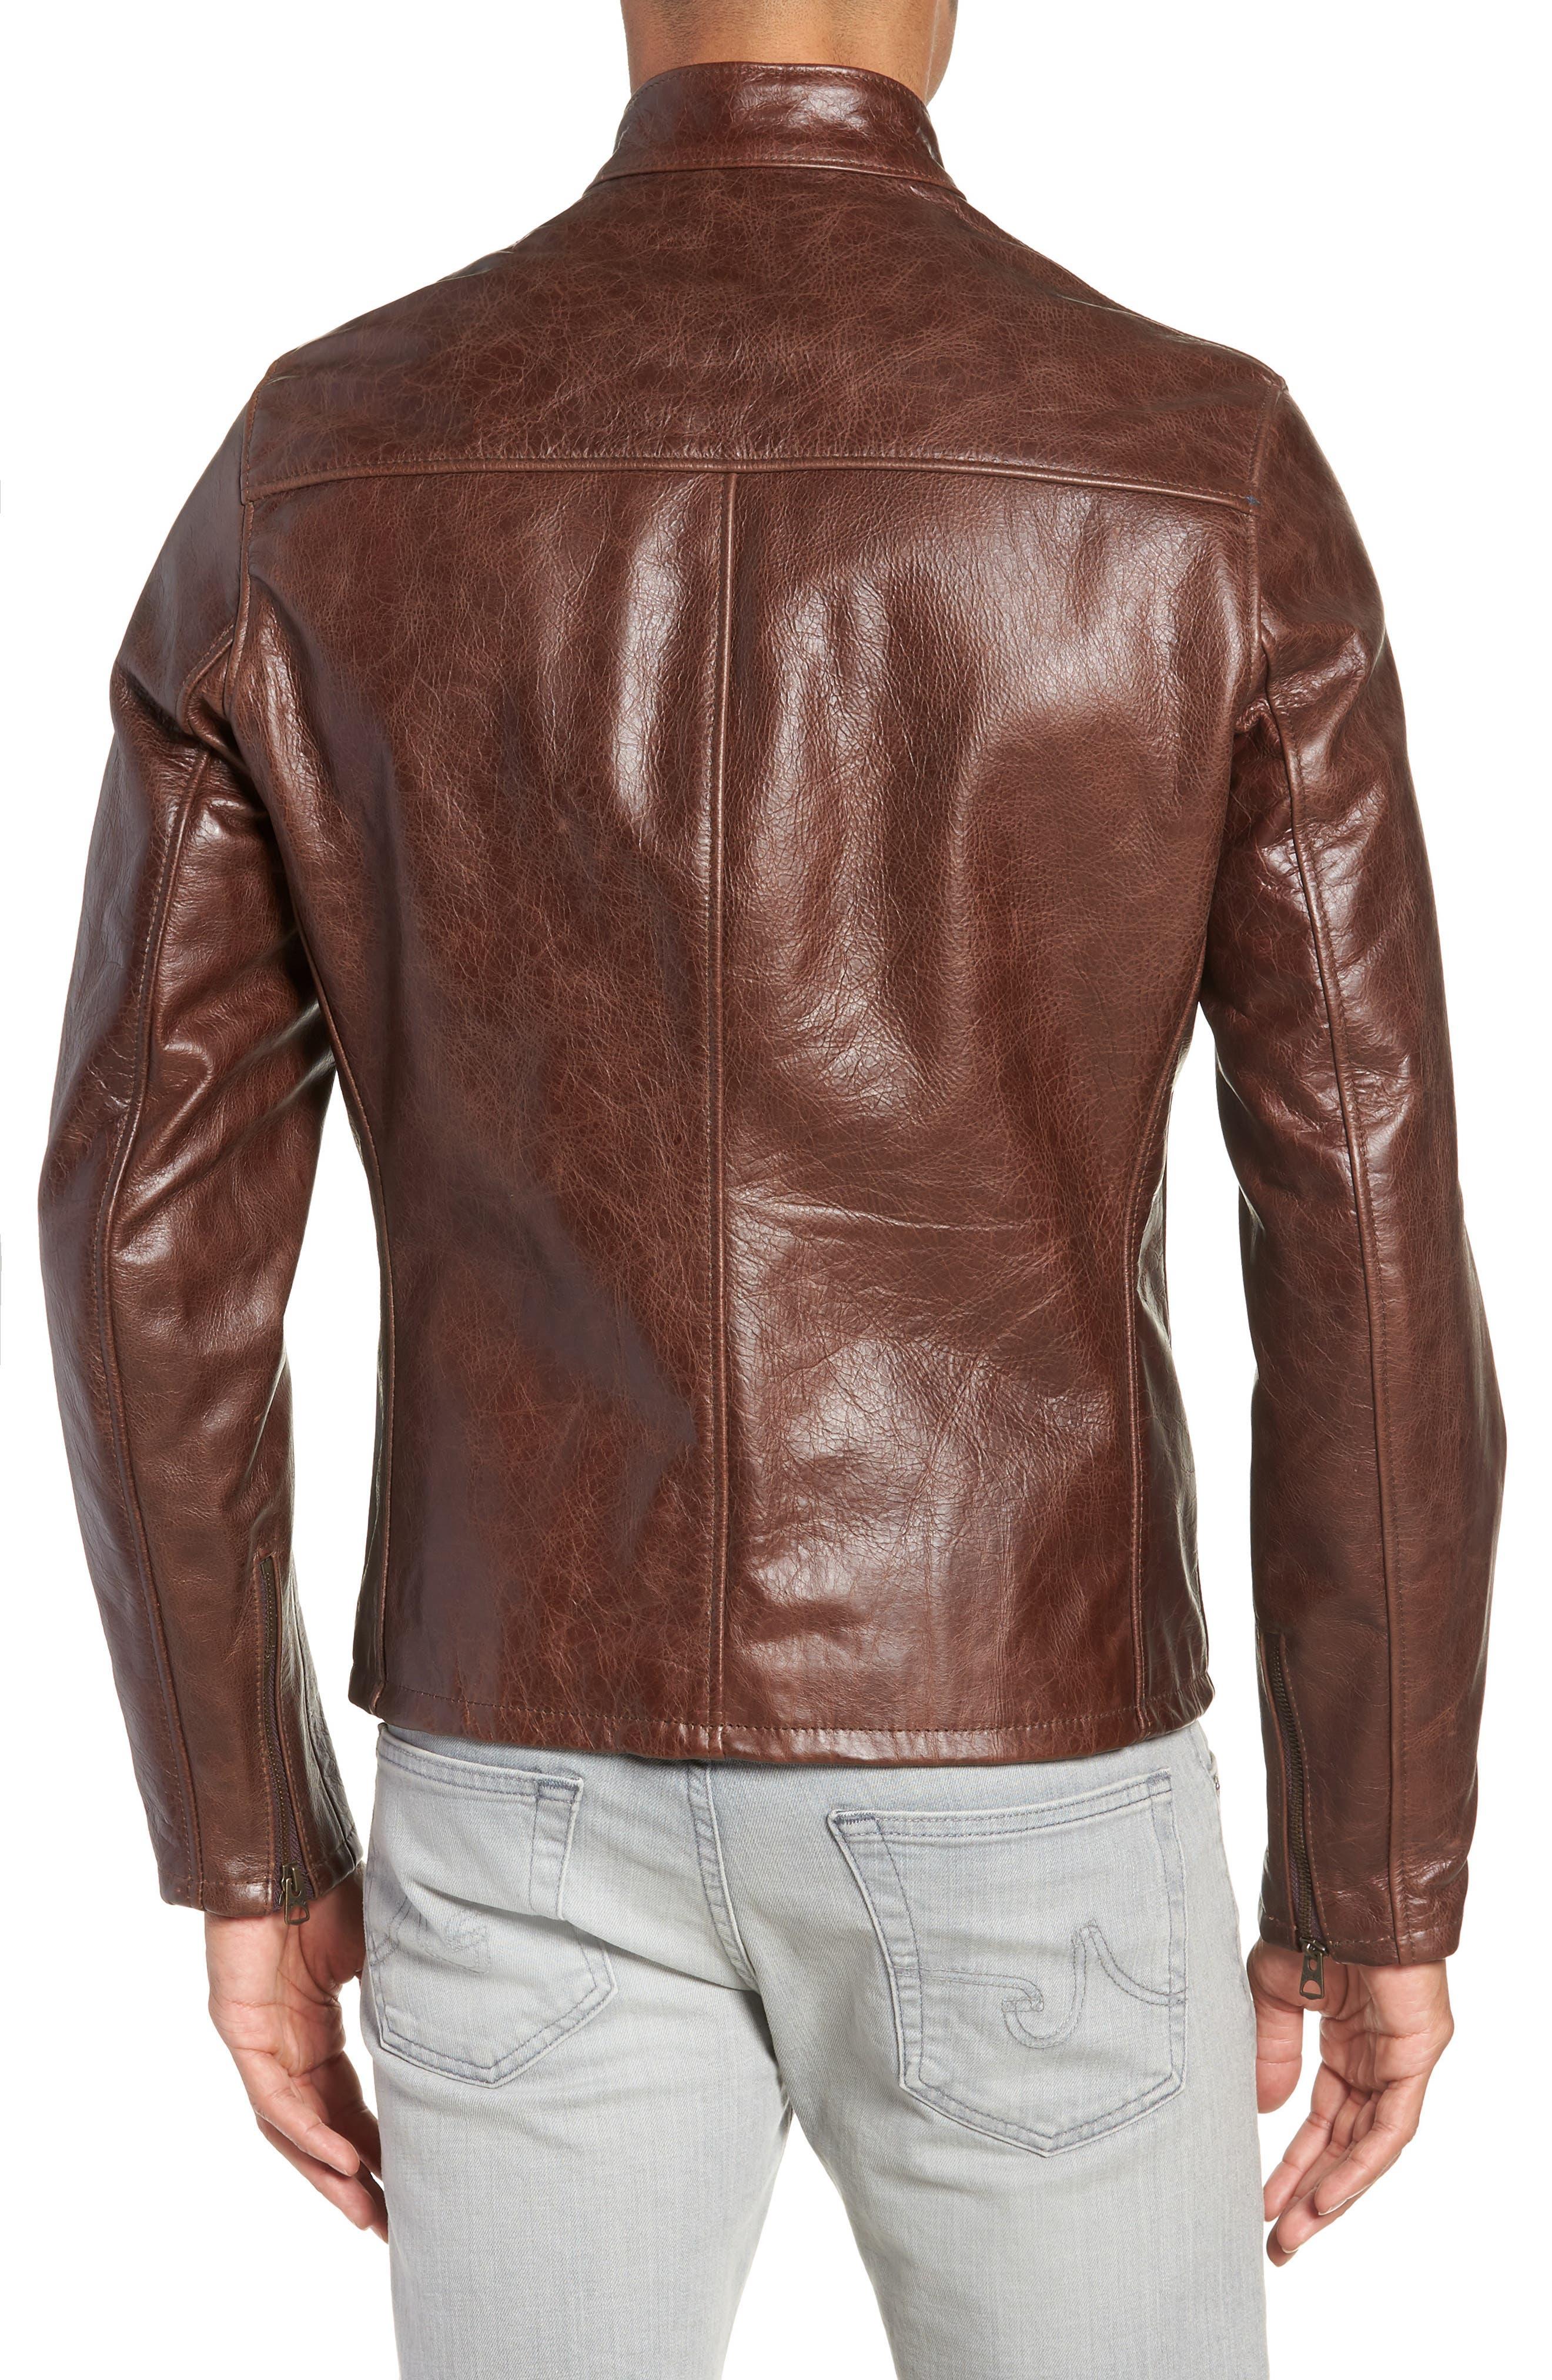 42284c4c45b5 Men s Leather (Genuine) Coats   Jackets